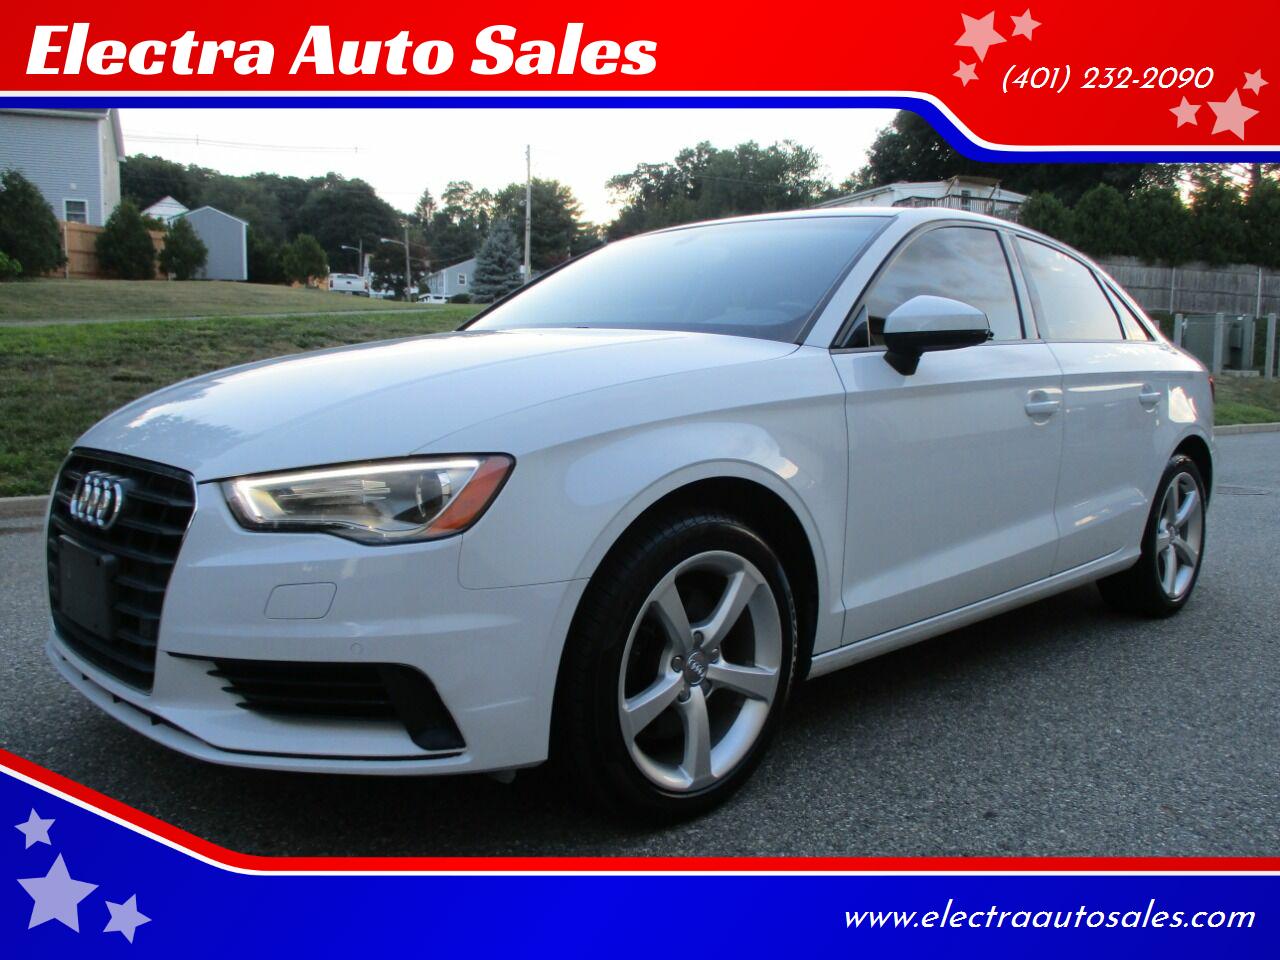 electra auto sales 42 putnam pike johnston ri 02919 buy sell auto mart buy sell auto mart